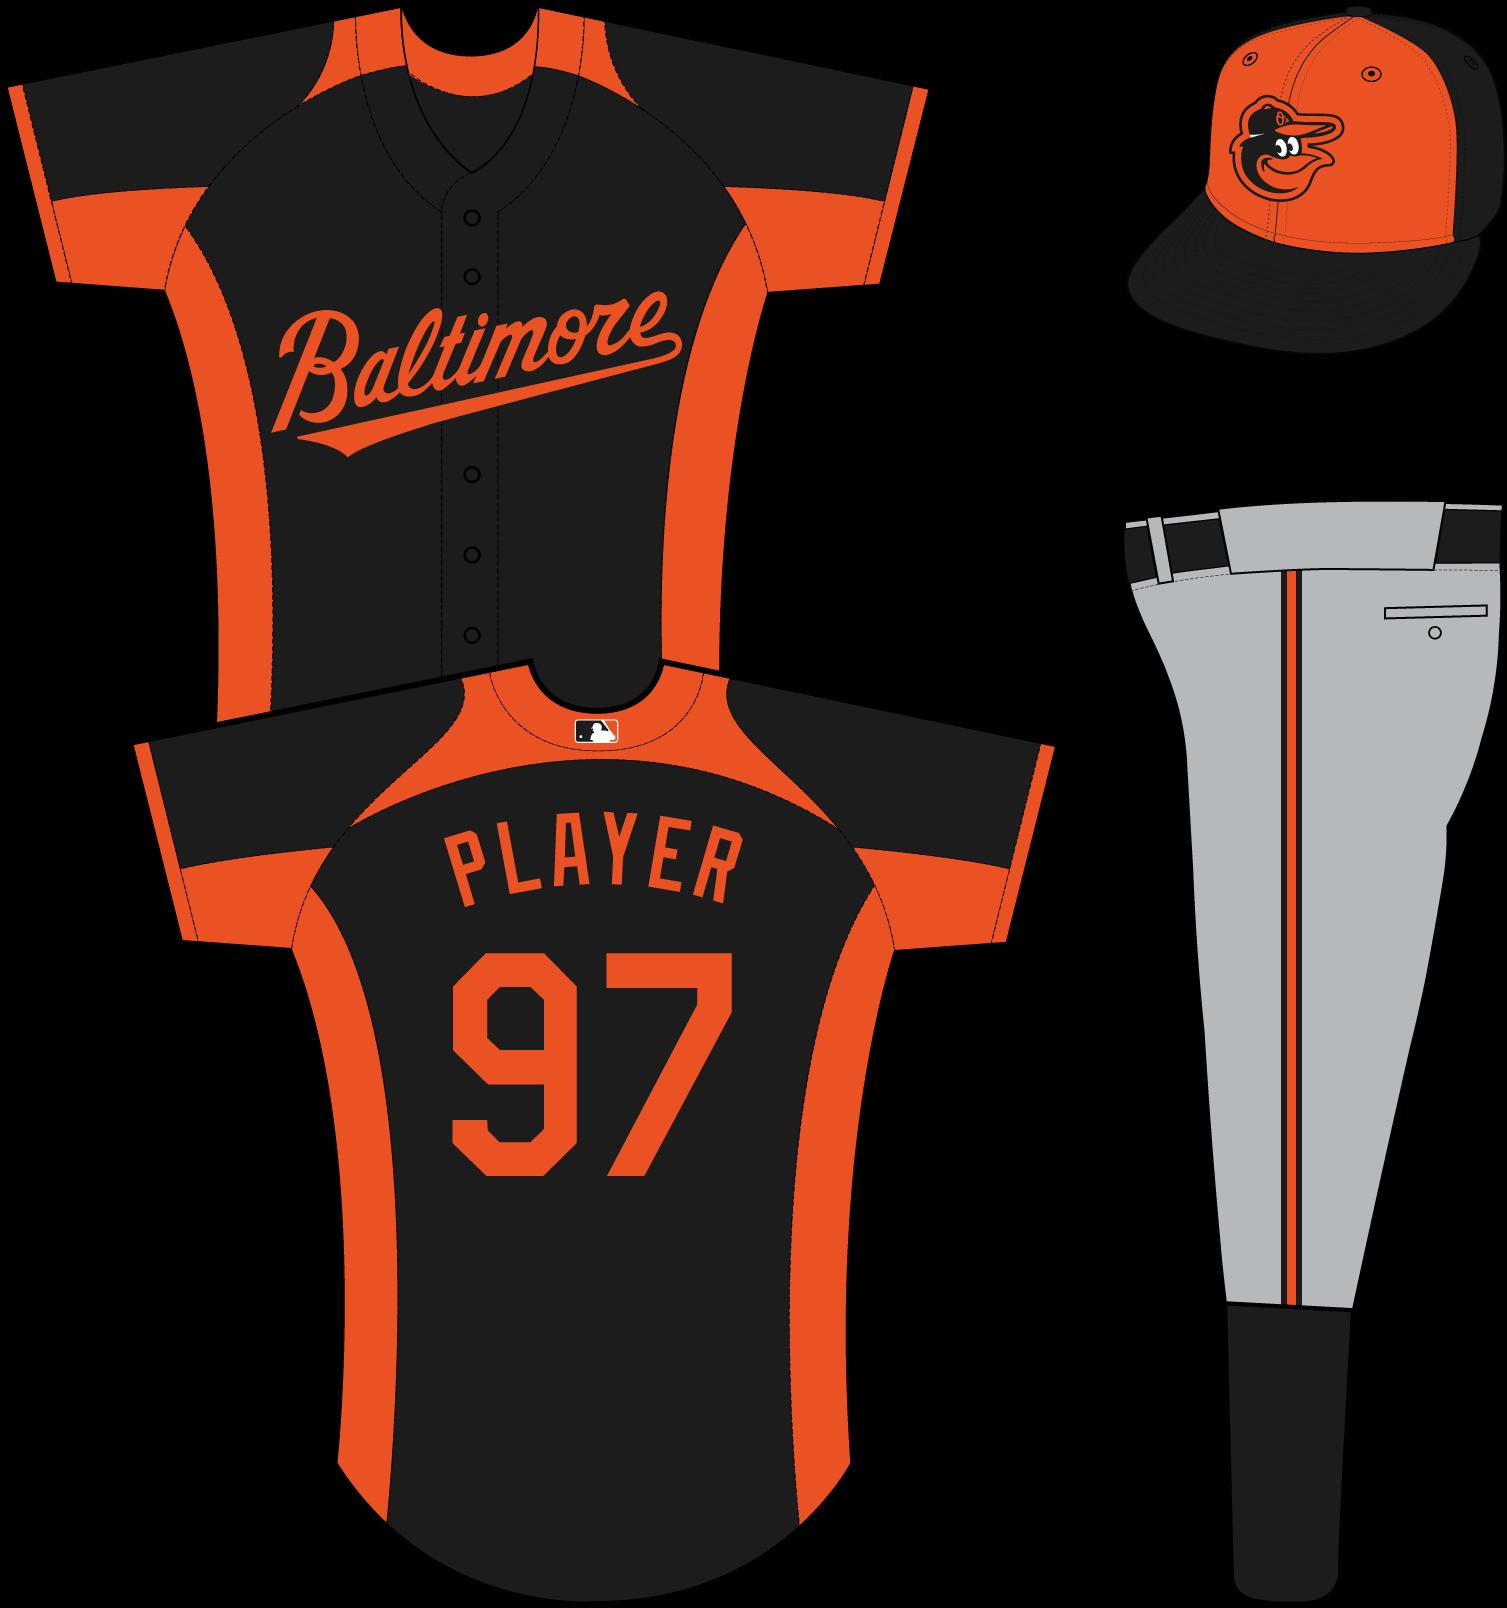 Baltimore Orioles Uniform Practice Uniform (2013-Pres) - (Road BP) Baltimore in orange on a black uniform with orange collar, sleeve end, underarm, and side panels SportsLogos.Net